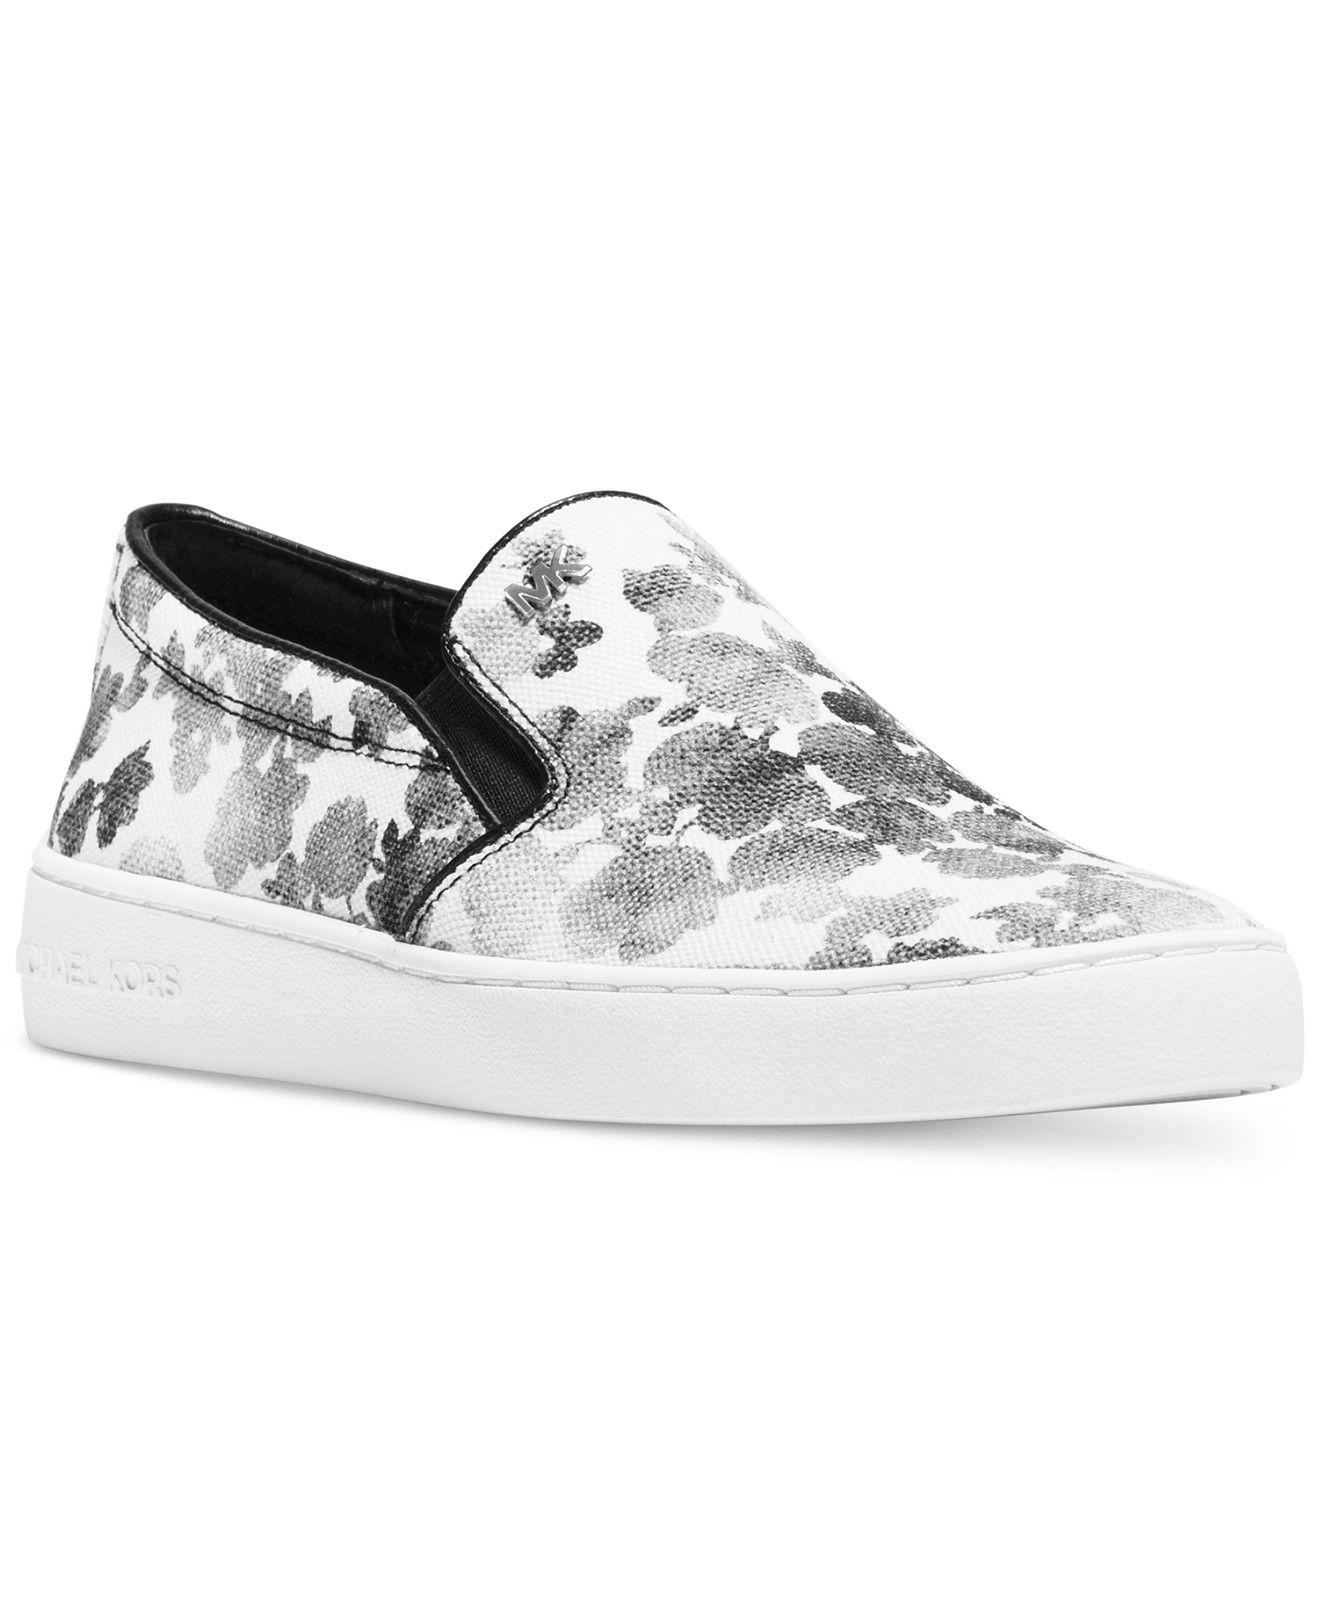 78ea9ddc931 MICHAEL Michael Kors Keaton Slip On Sneakers - MICHAEL Michael Kors - Shoes  - Macy's